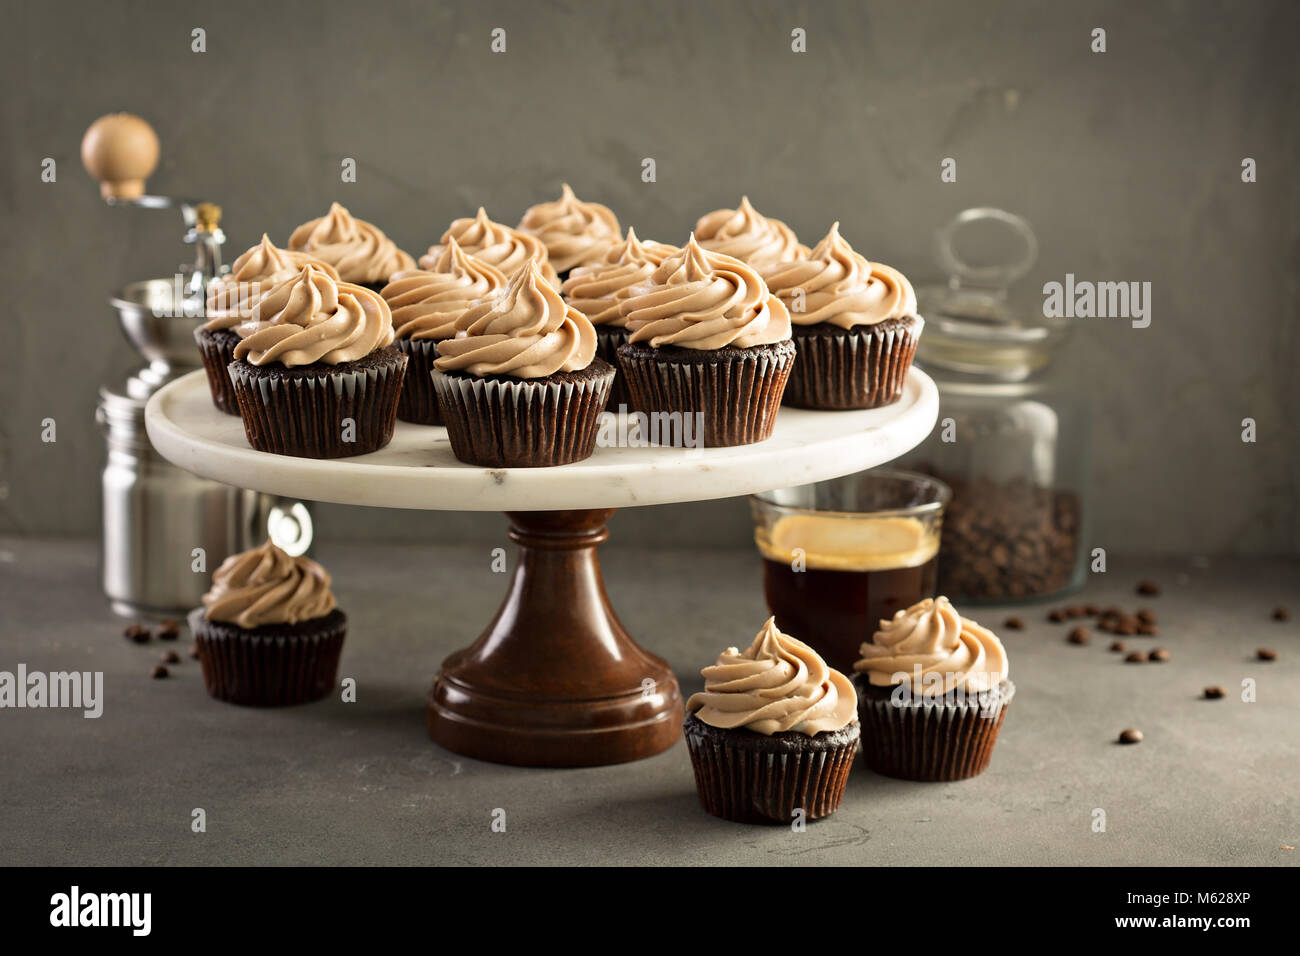 Chocolate espresso cupcakes - Stock Image